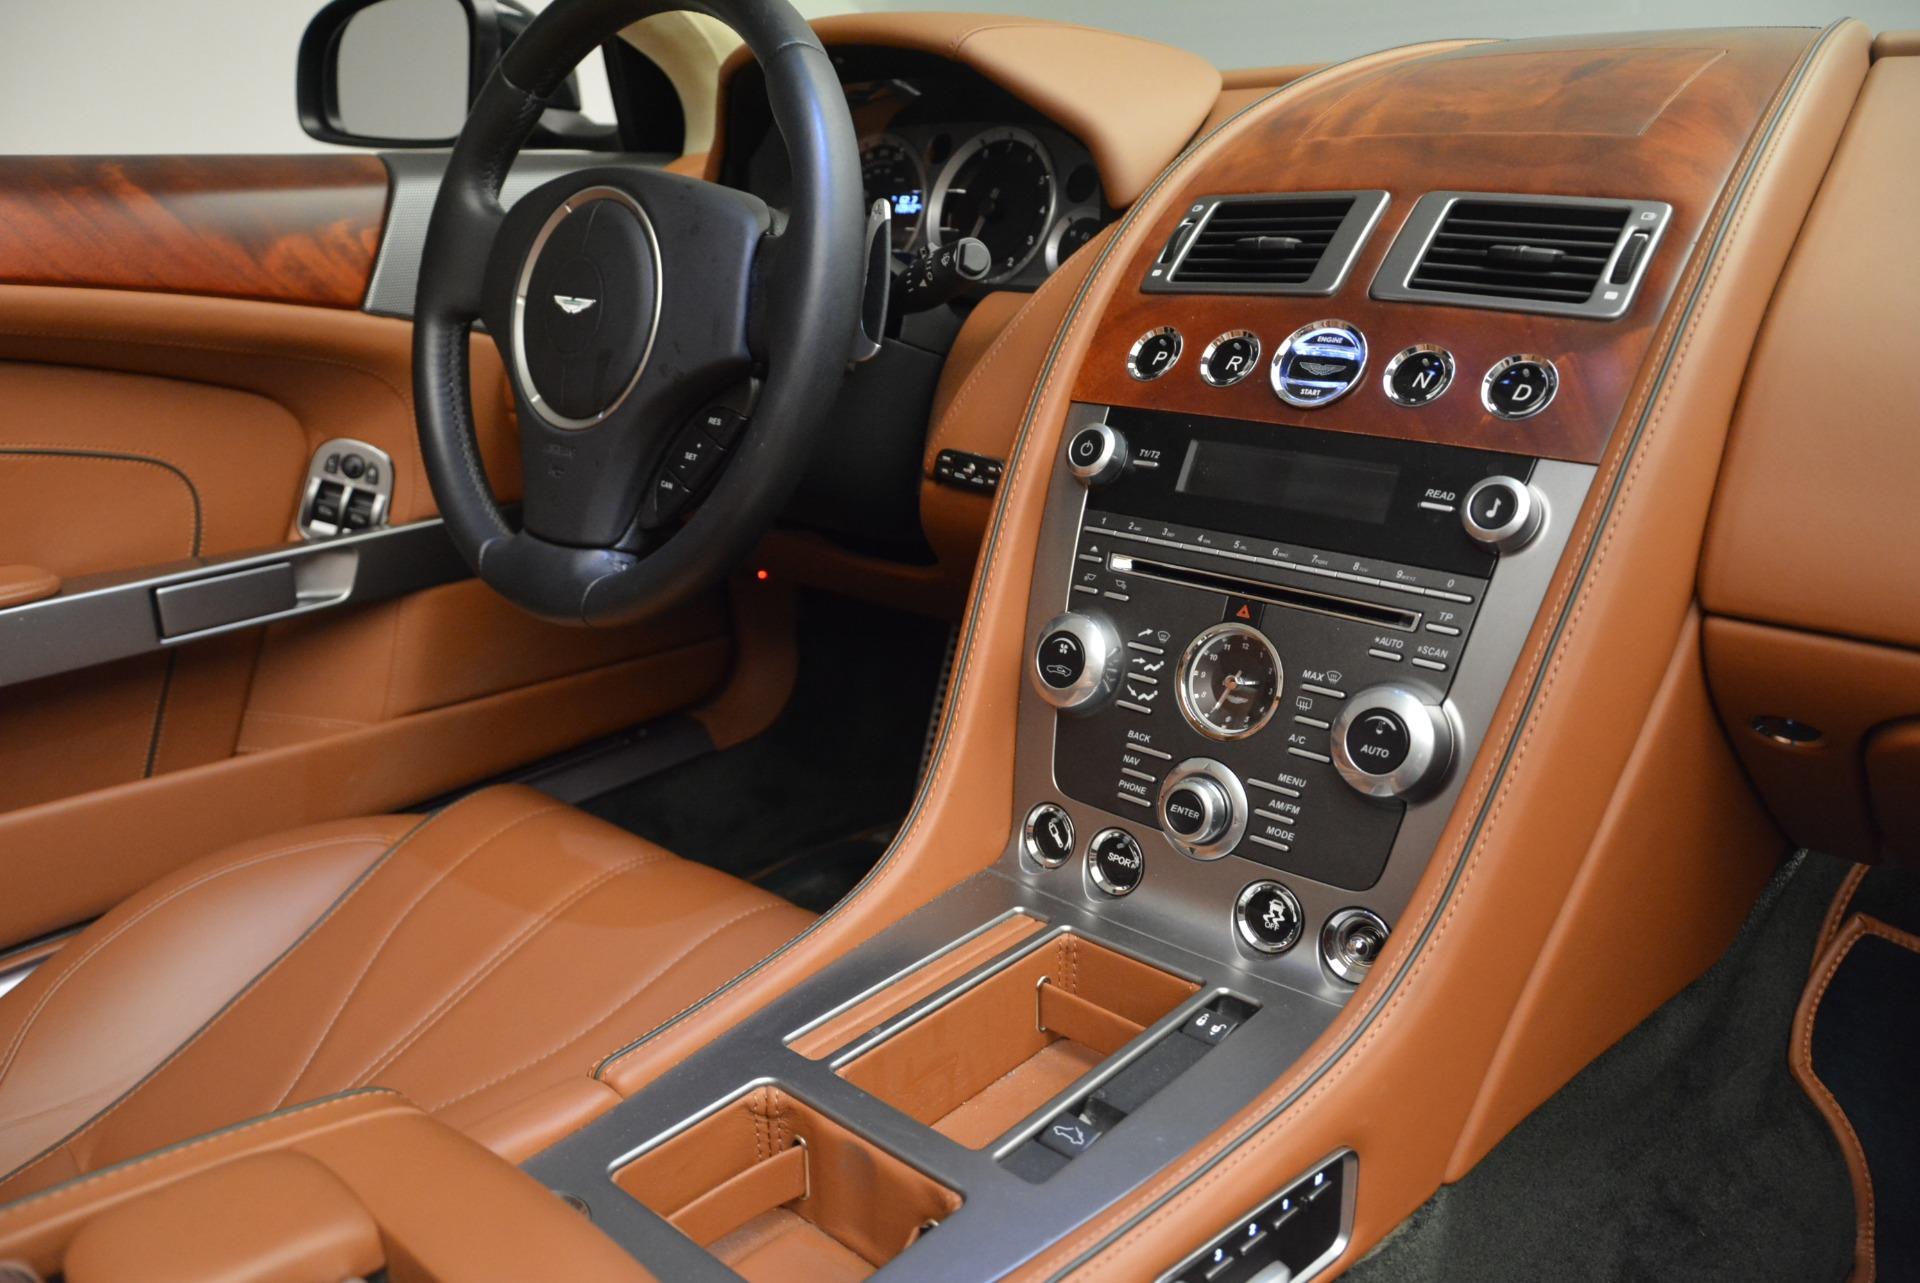 Used 2012 Aston Martin Virage Volante For Sale 95900 In Greenwich, CT